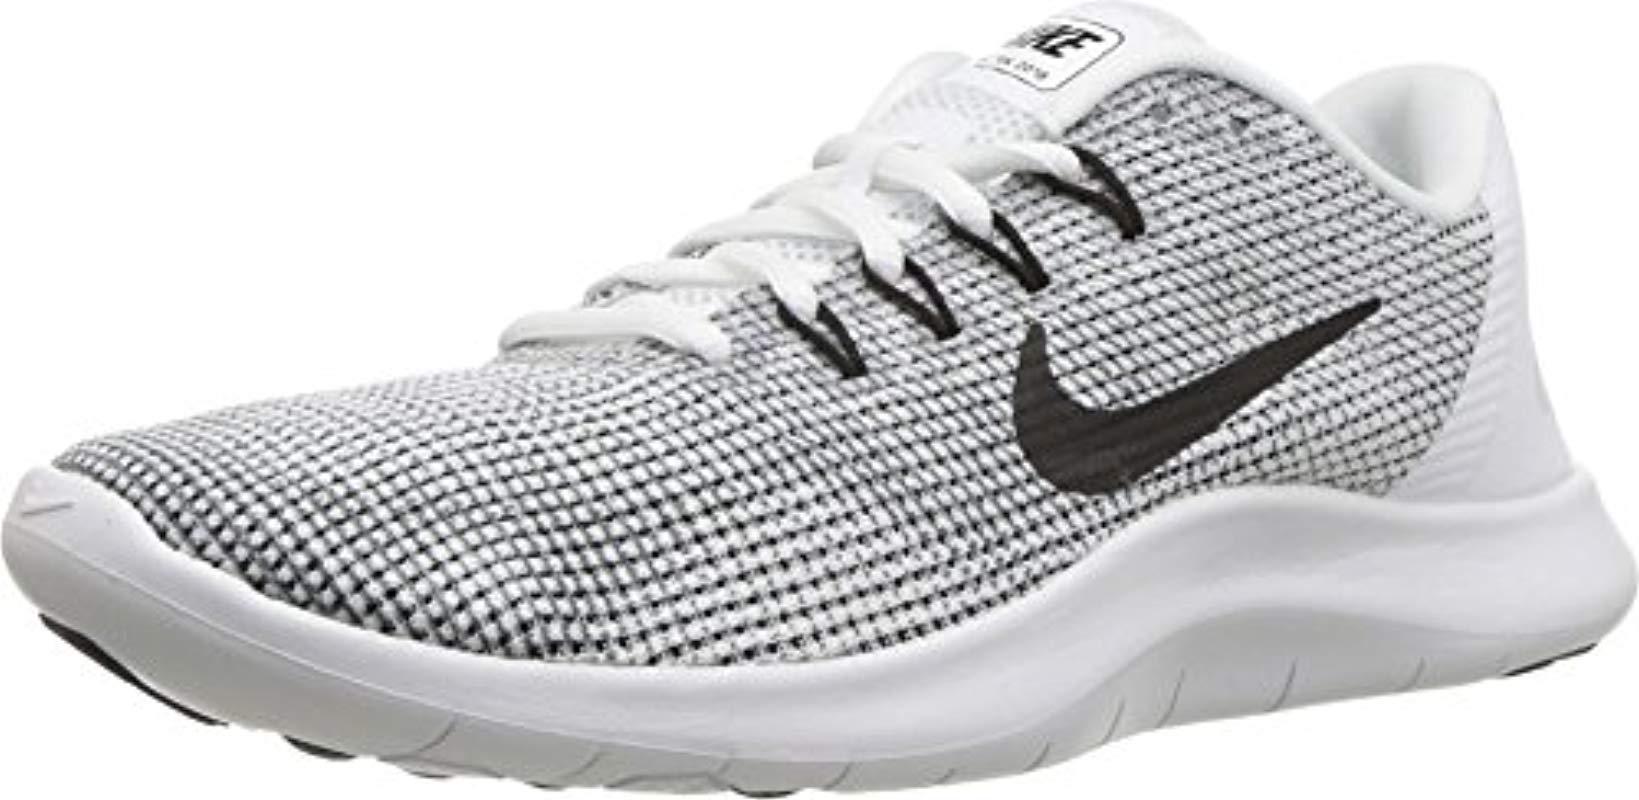 f8f8110dbcf0f Nike  s Wmns Flex 2018 Rn Running Shoes in White - Lyst